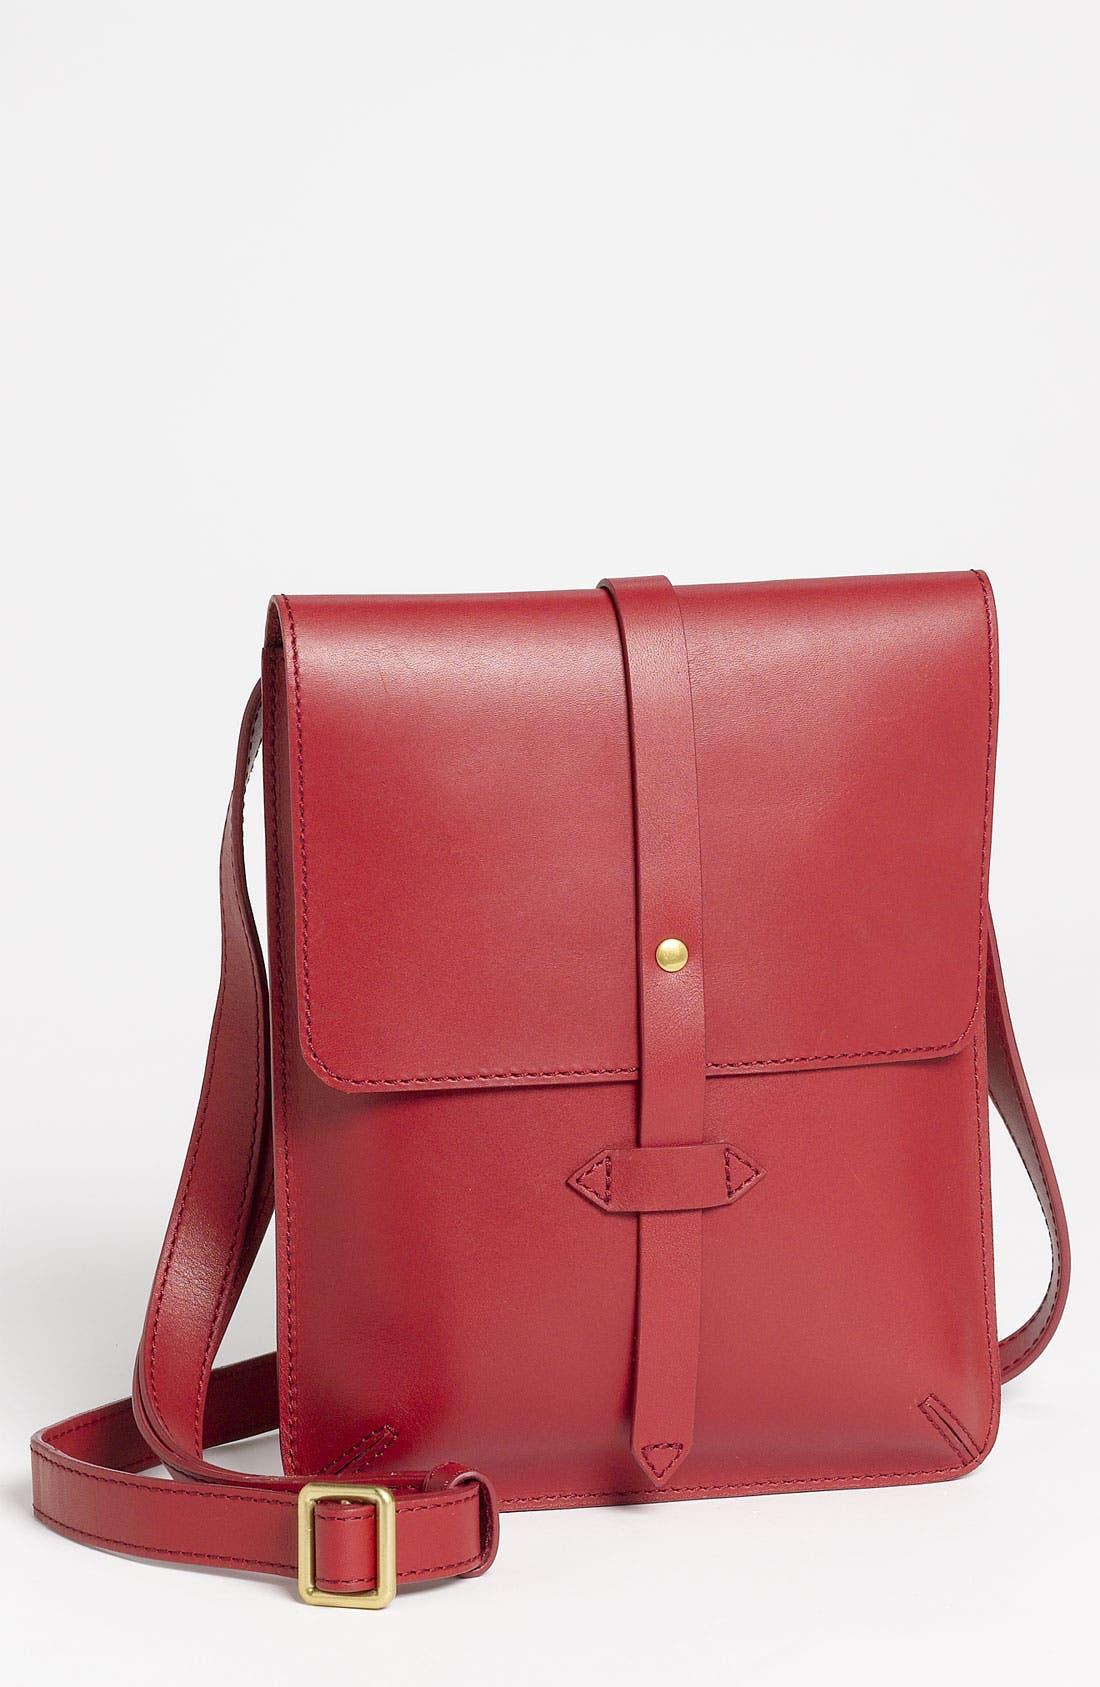 Main Image - IIIBeCa By Joy Gryson 'Chambers Street' Crossbody Bag